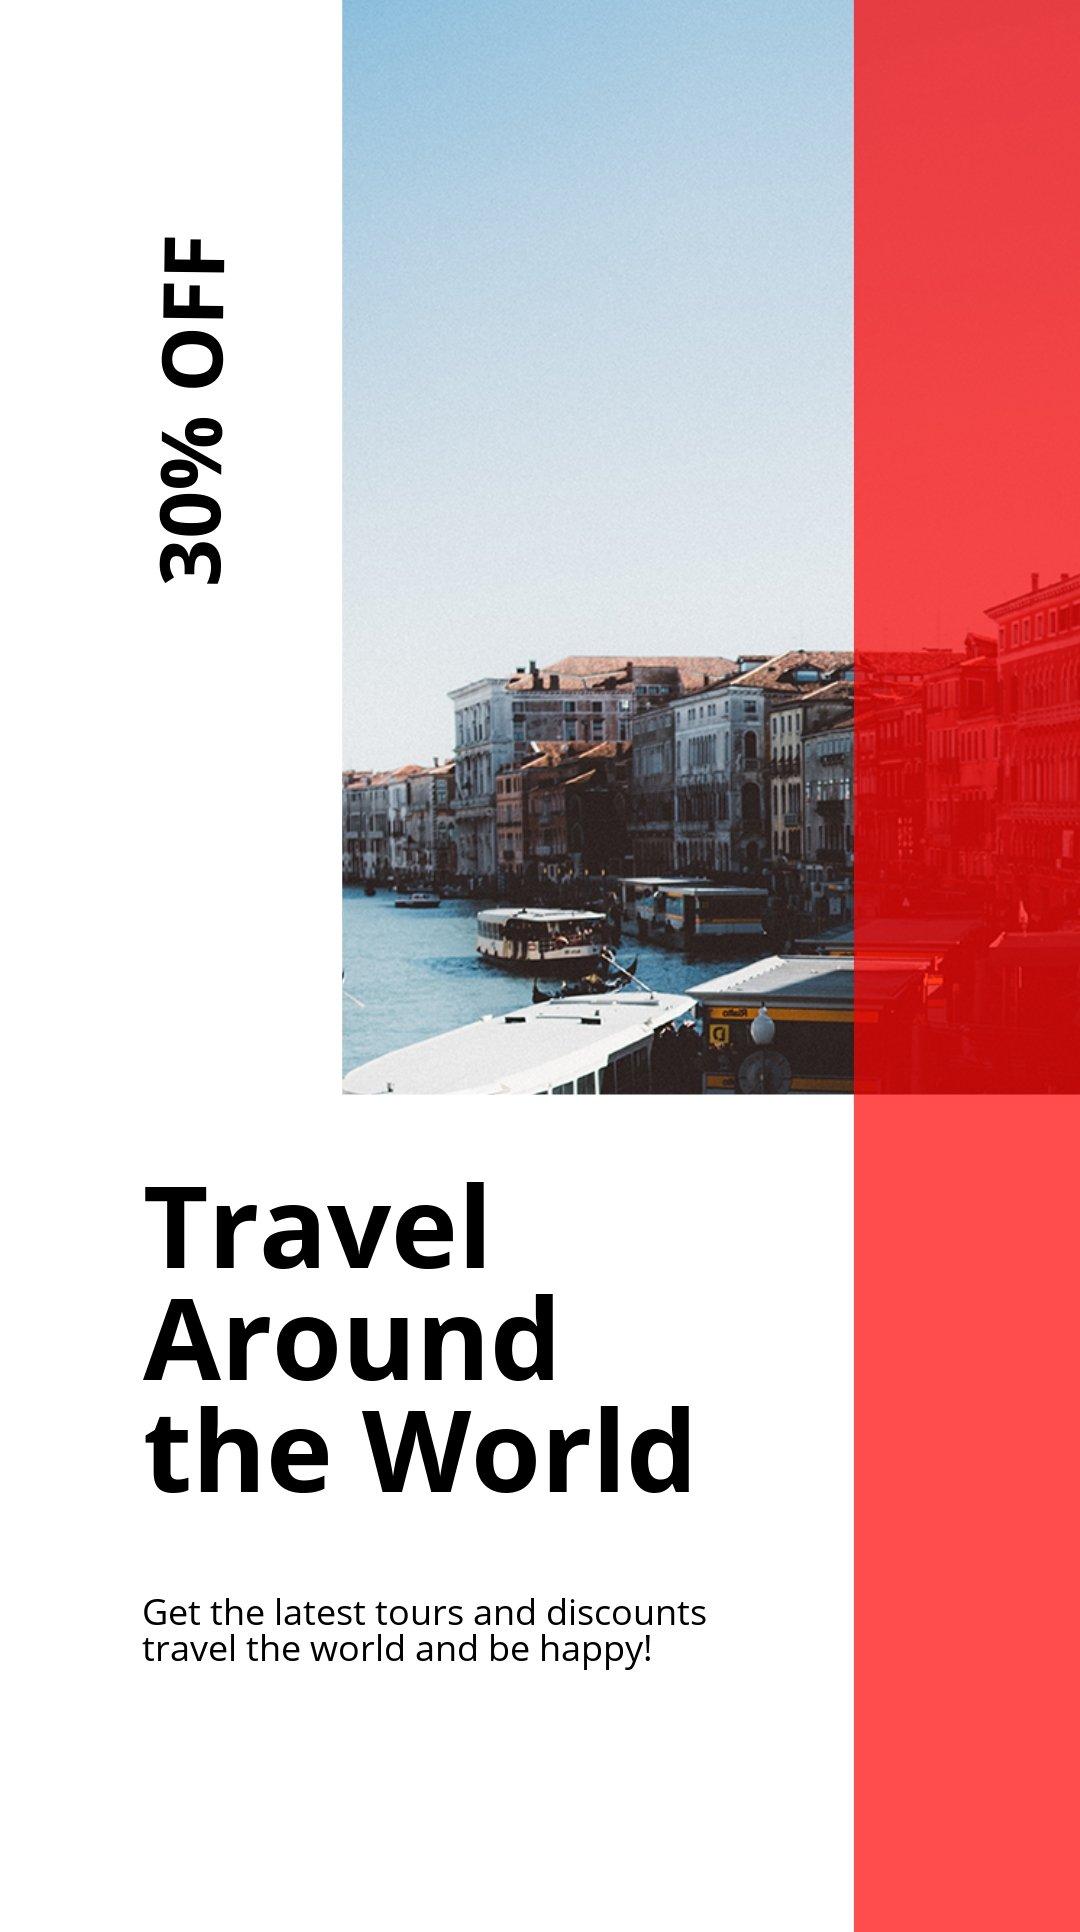 Modern Travel Instagram Story Template